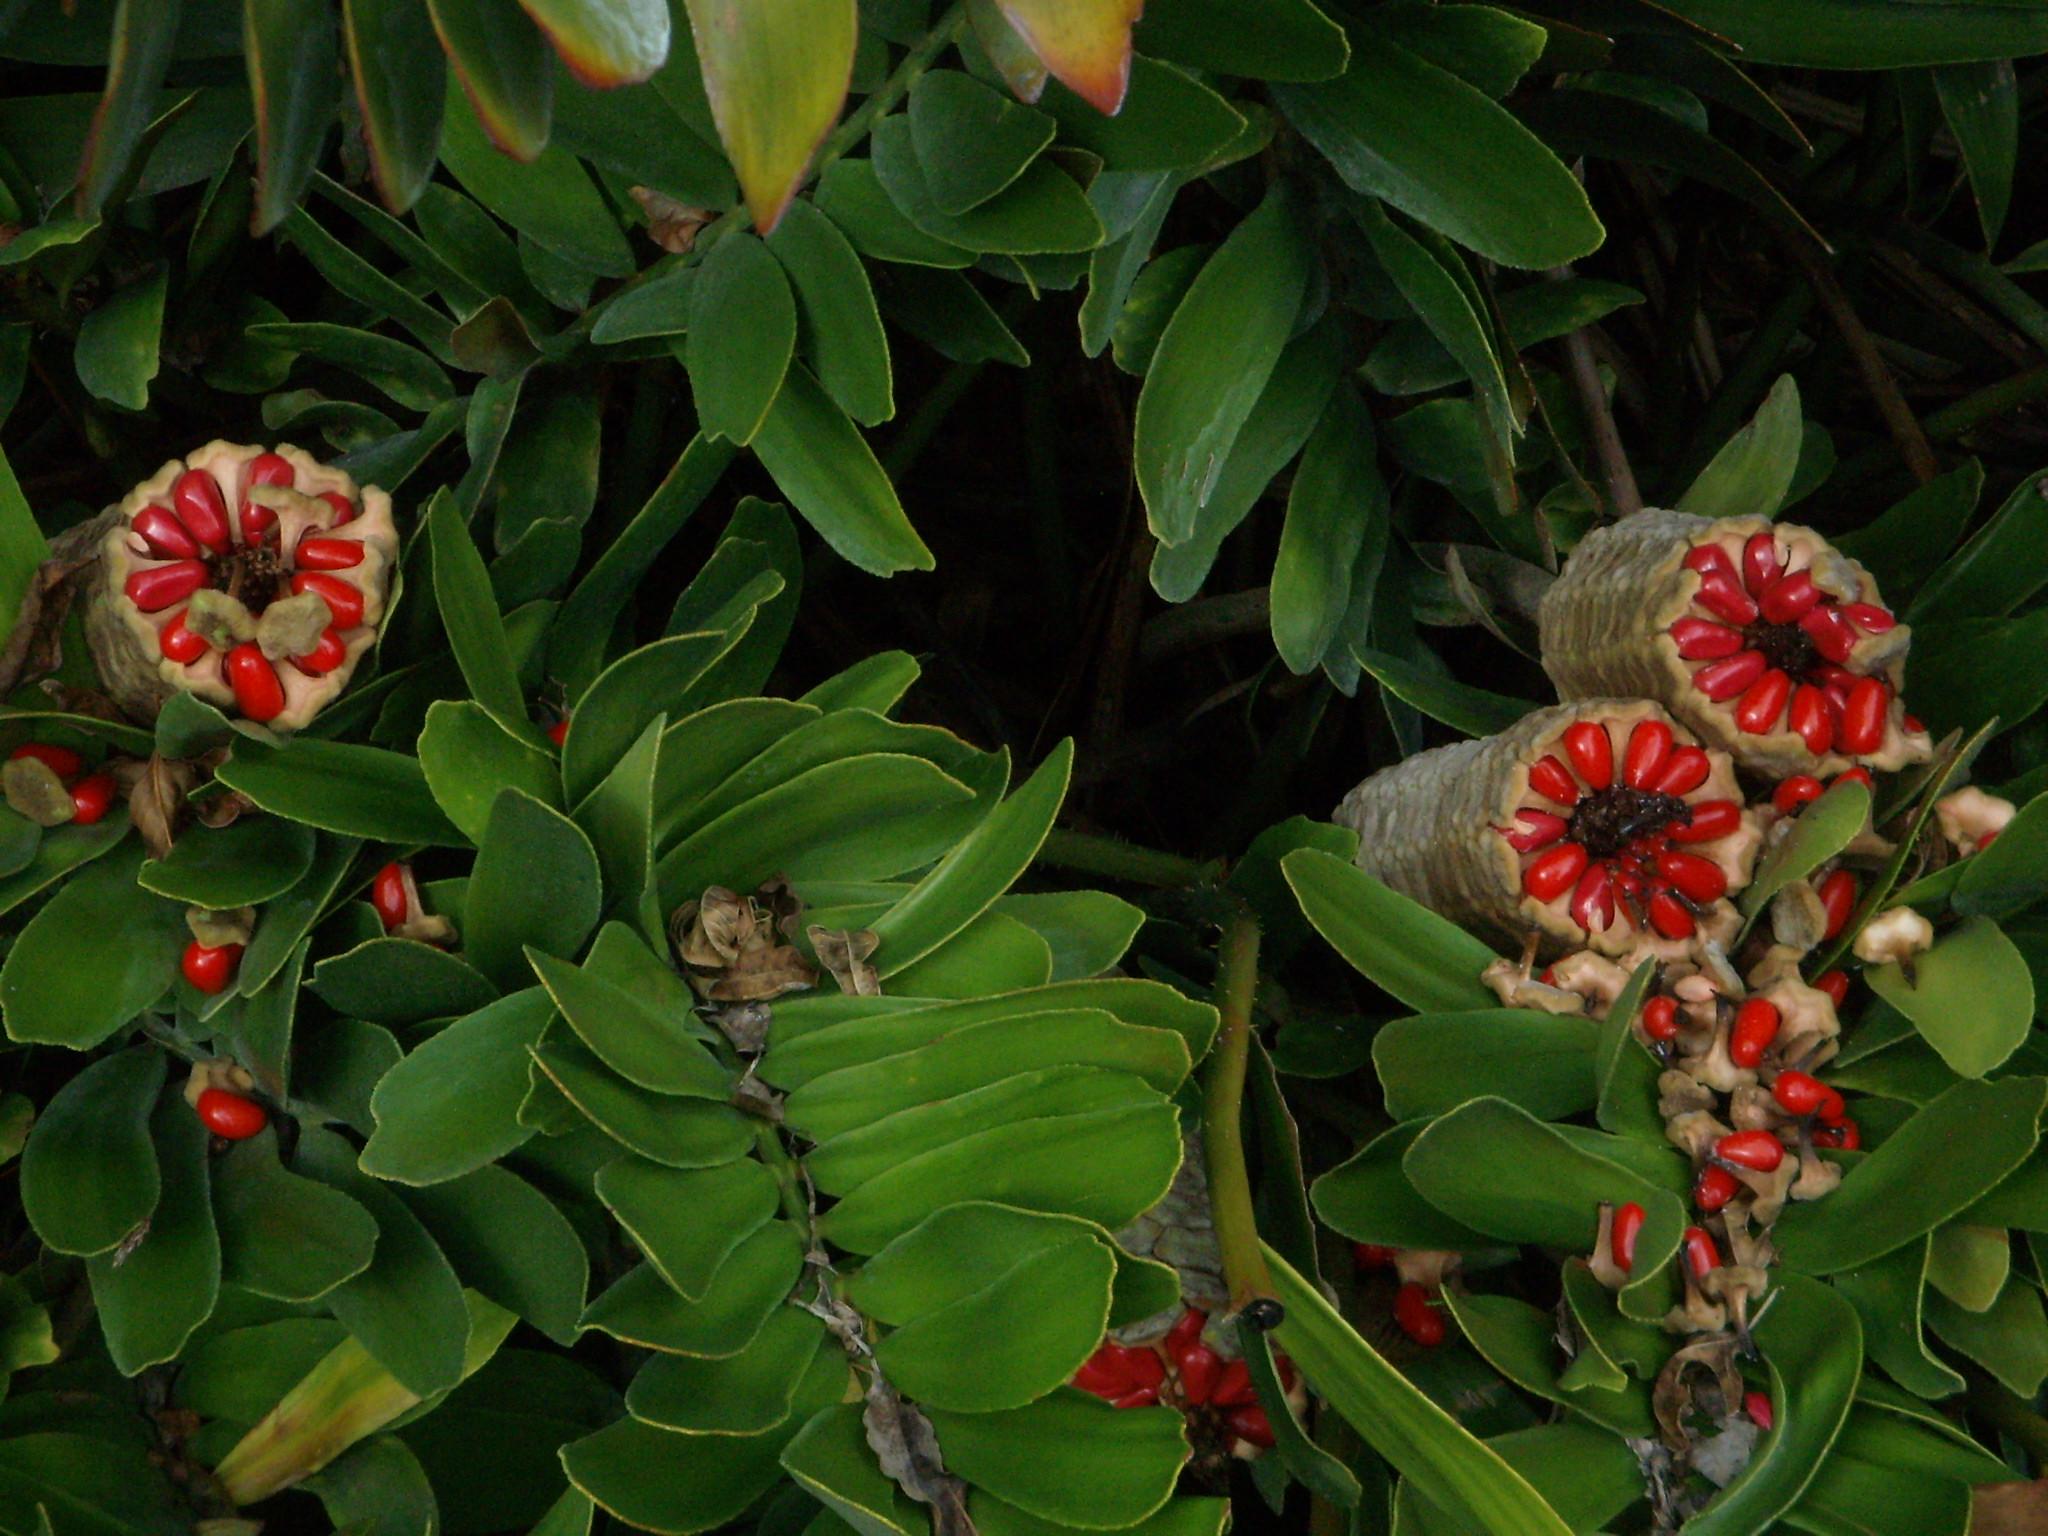 flowers | Serenity Spell